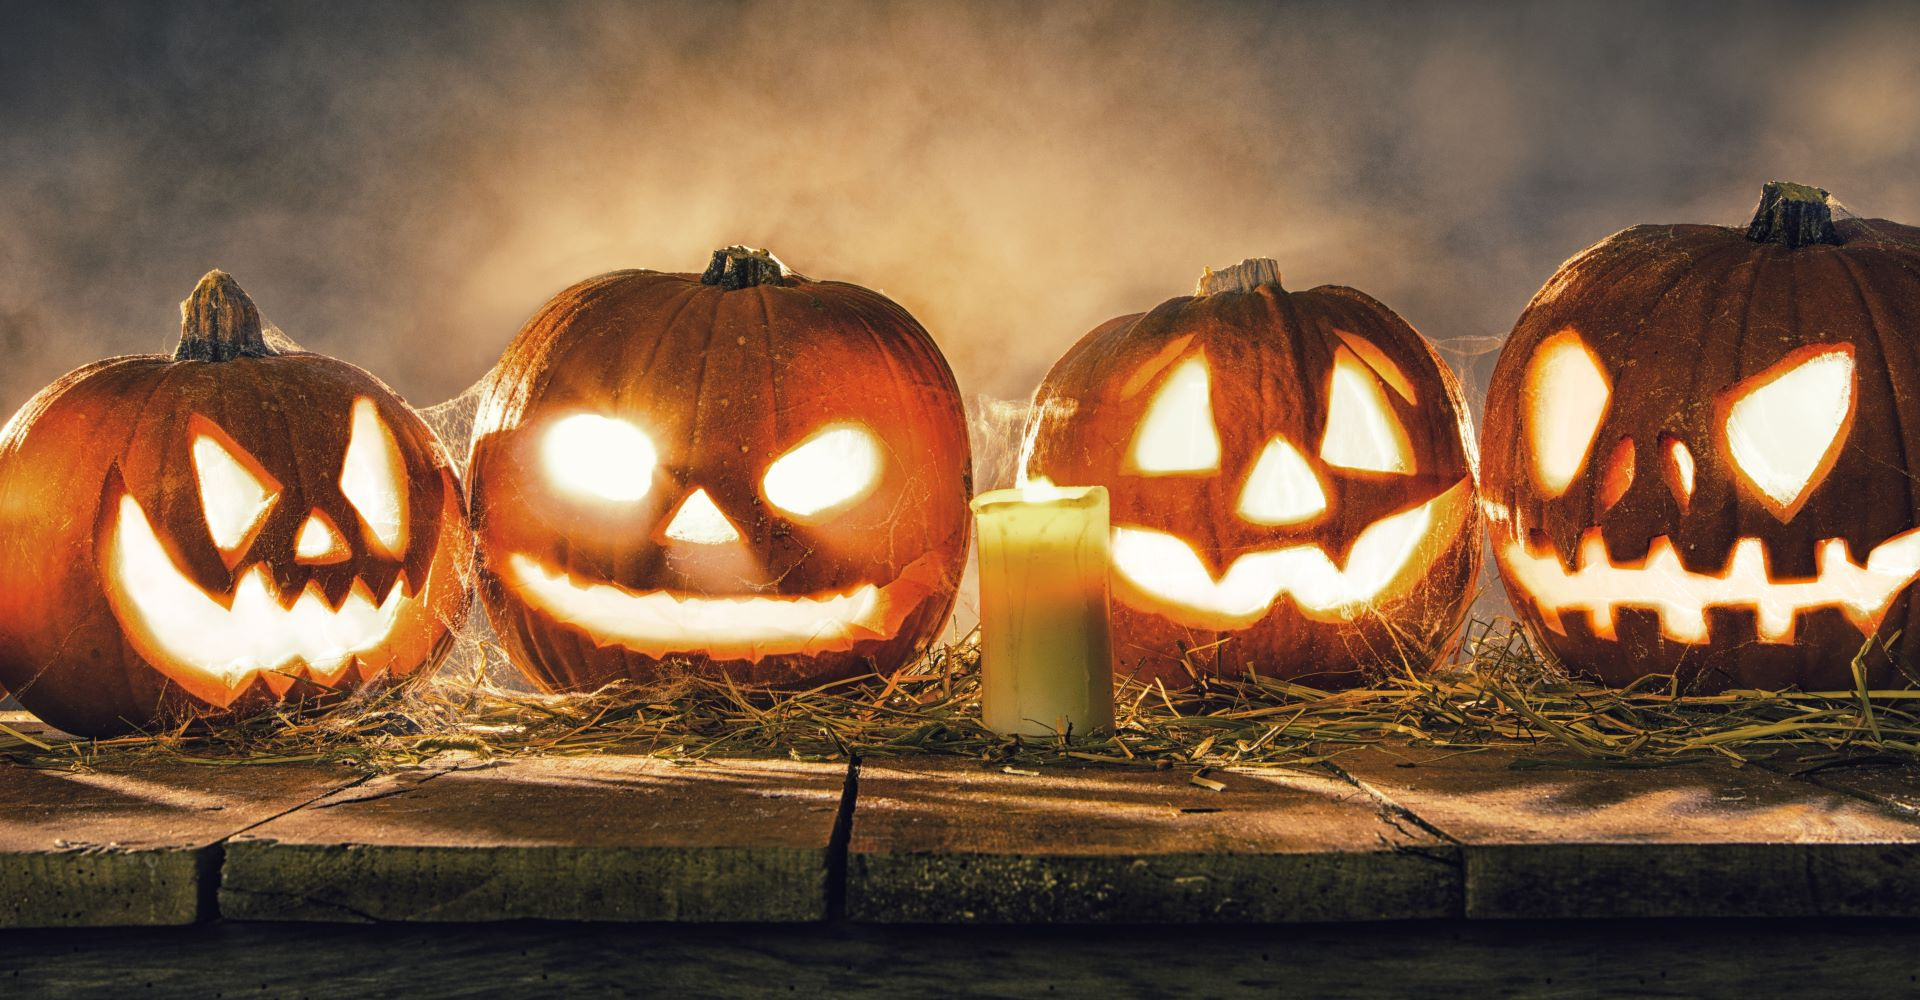 spinnweben f r halloween eine gruselige atmosph re. Black Bedroom Furniture Sets. Home Design Ideas